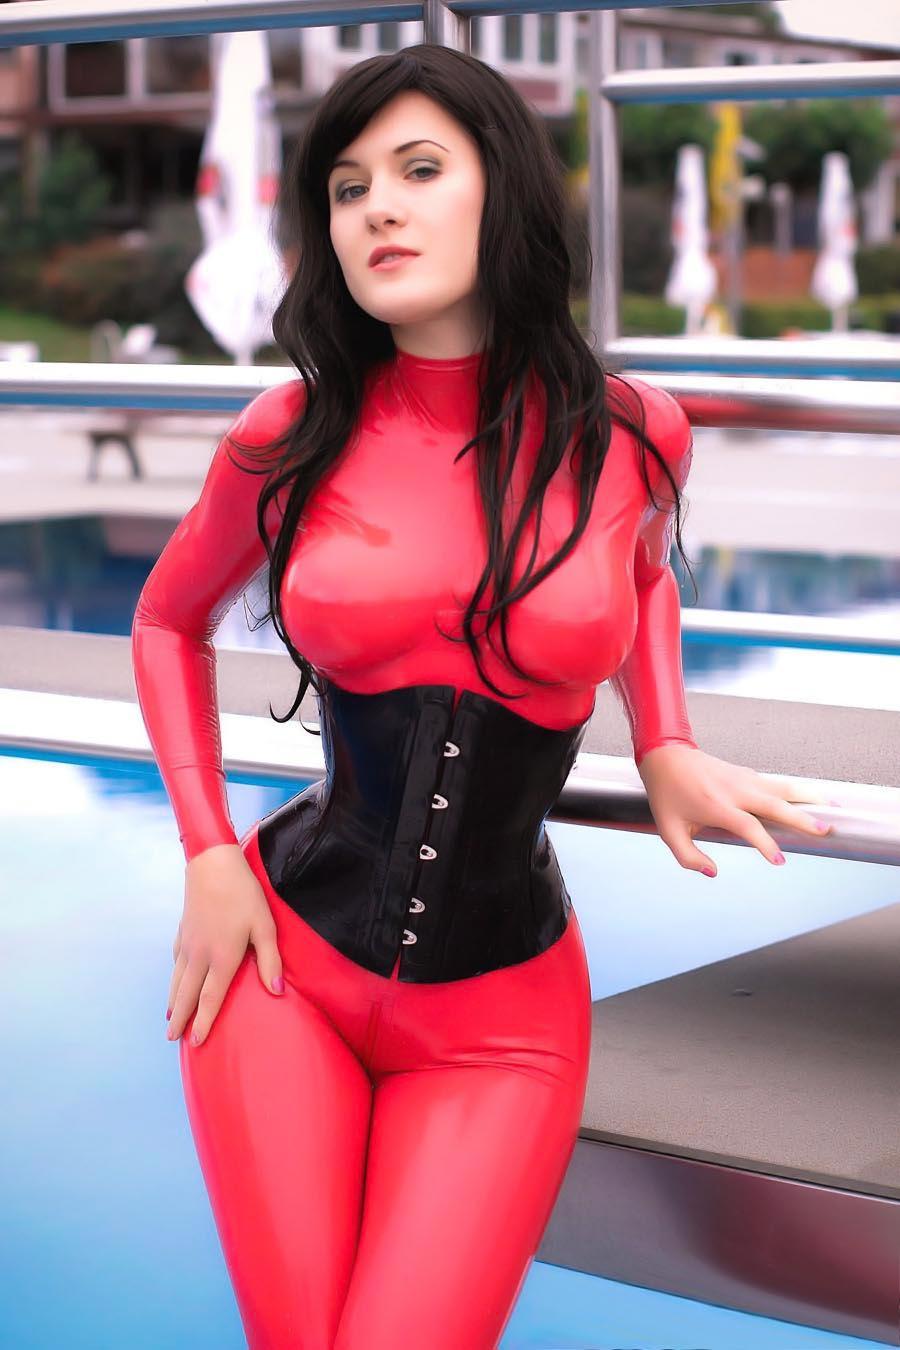 sexy+tight+corset+(61).jpg